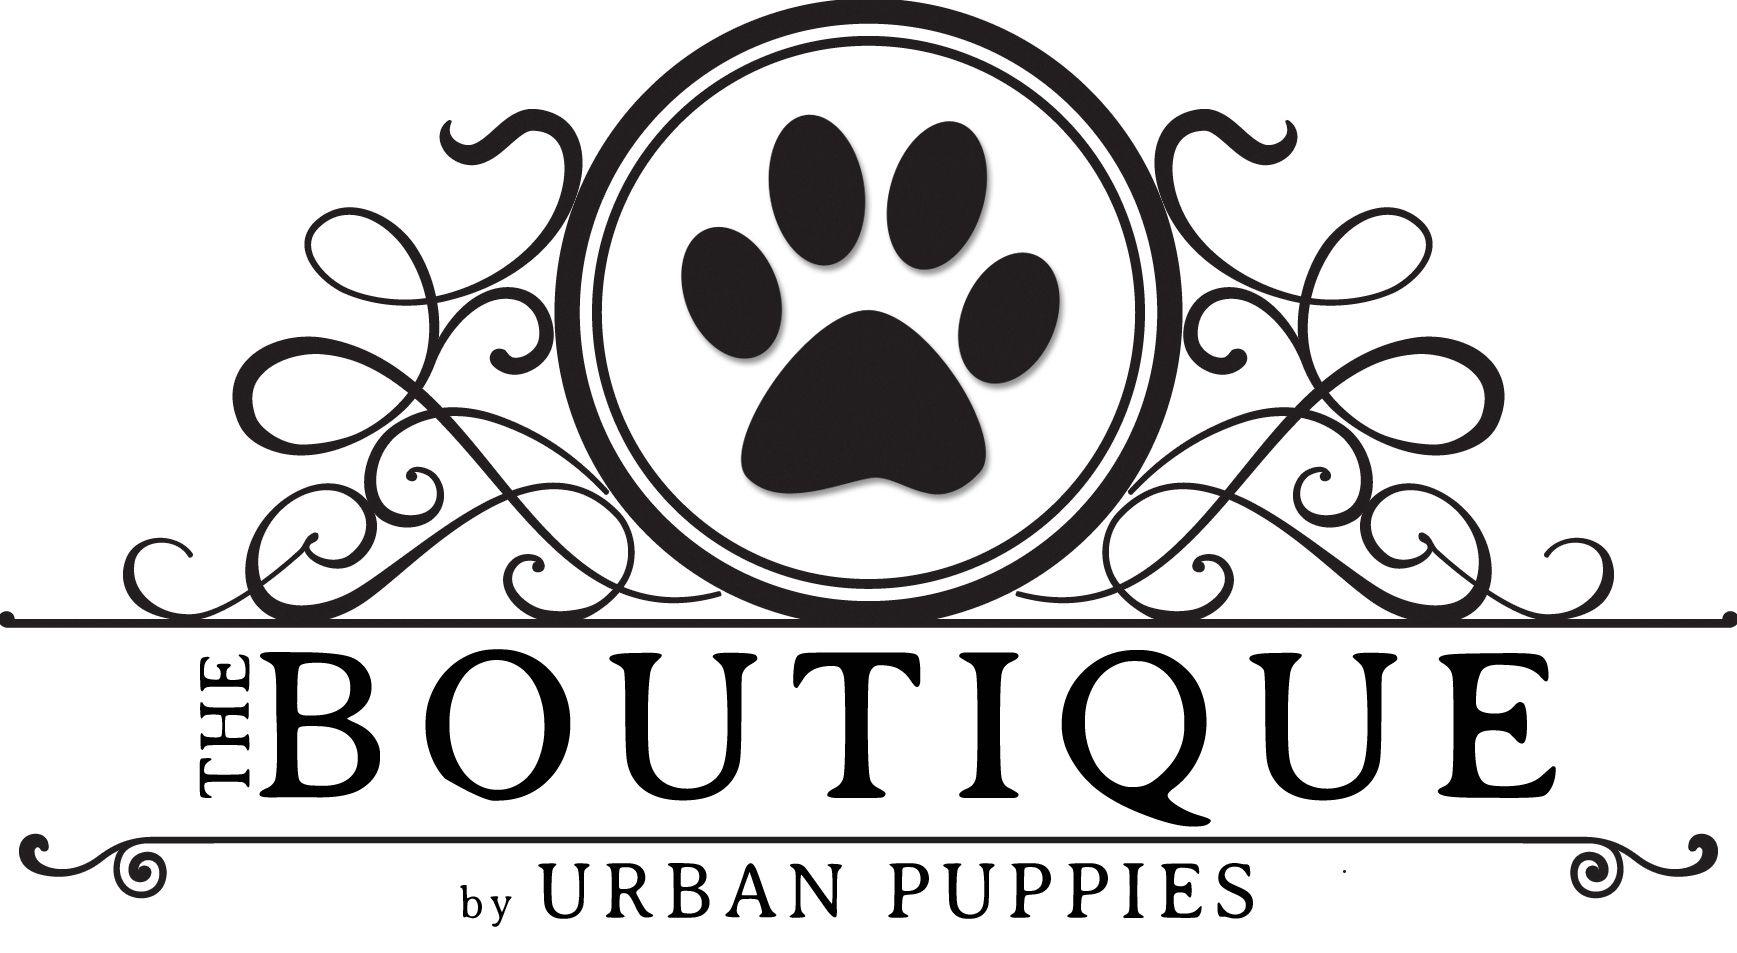 Urban Puppies In Agoura Hills Ca Puppies Urban Novelty Sign